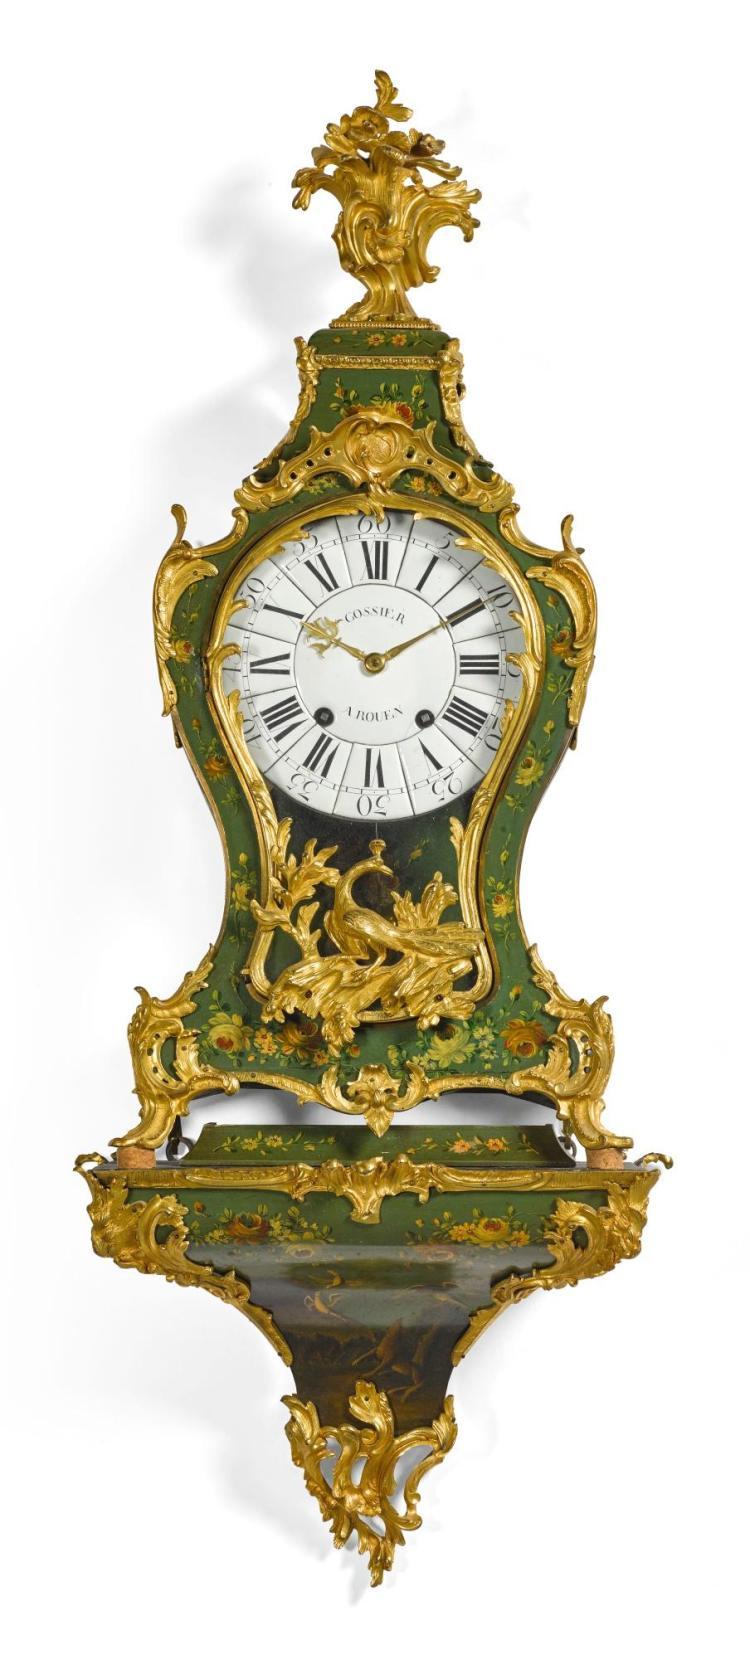 ALOUIS XVORMOLU MOUNTEDVERNIS MARTIN BRACKET CLOCK, JACQUES GOSSIER, ROUEN, CIRCA 1750 |